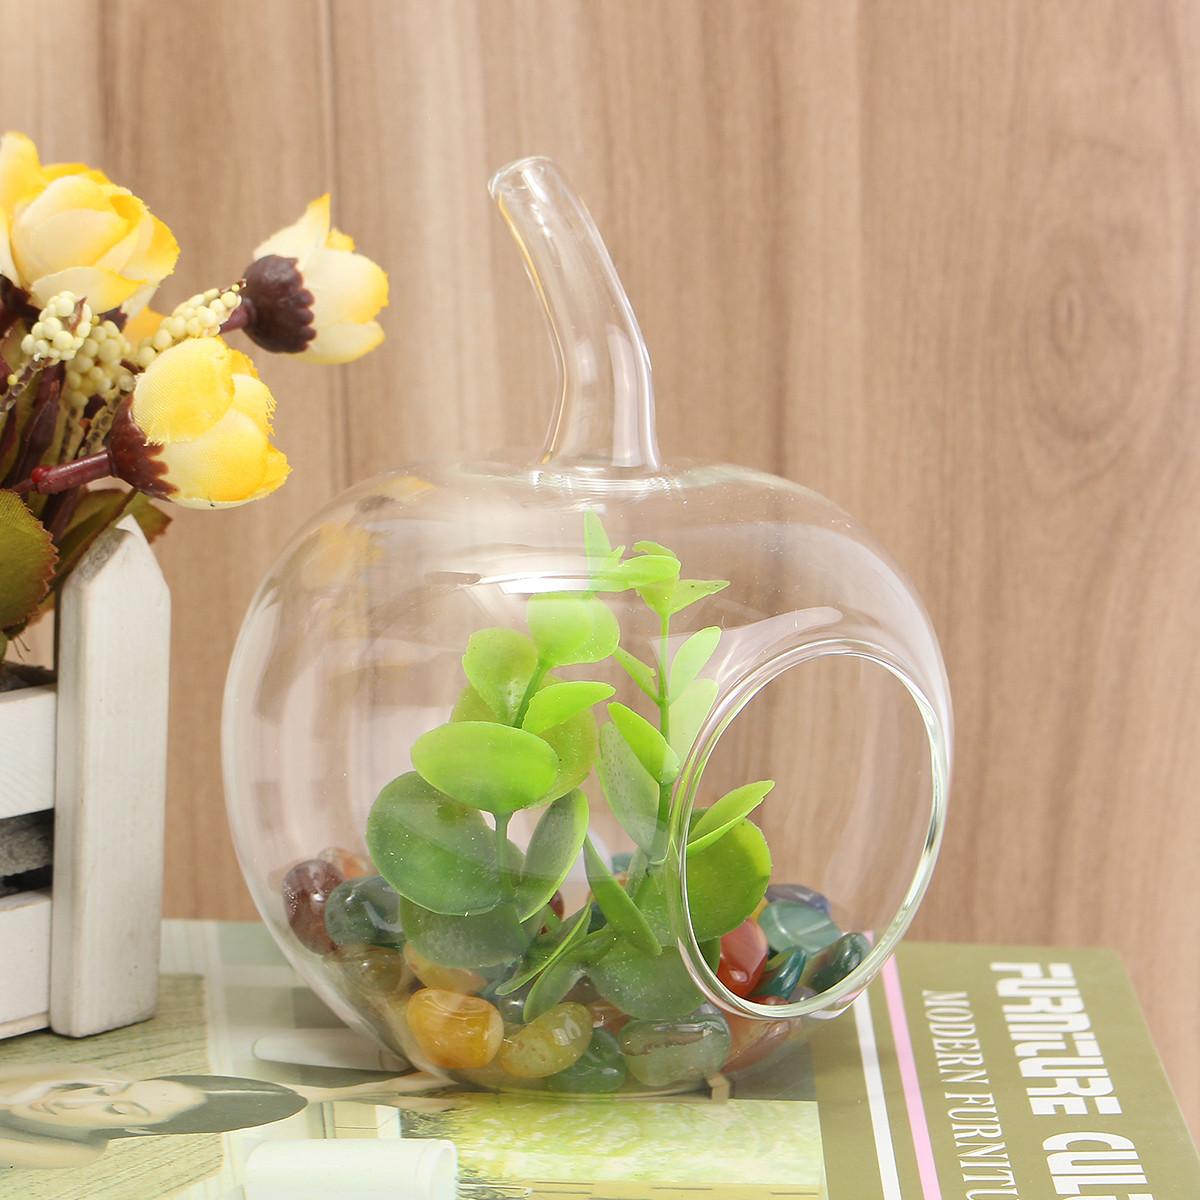 Volkswagen Flower Vase Of Plants Crystal Glass Flower Vase Terrarium Container Micro In 1 X Crystal Glass Flower Vase